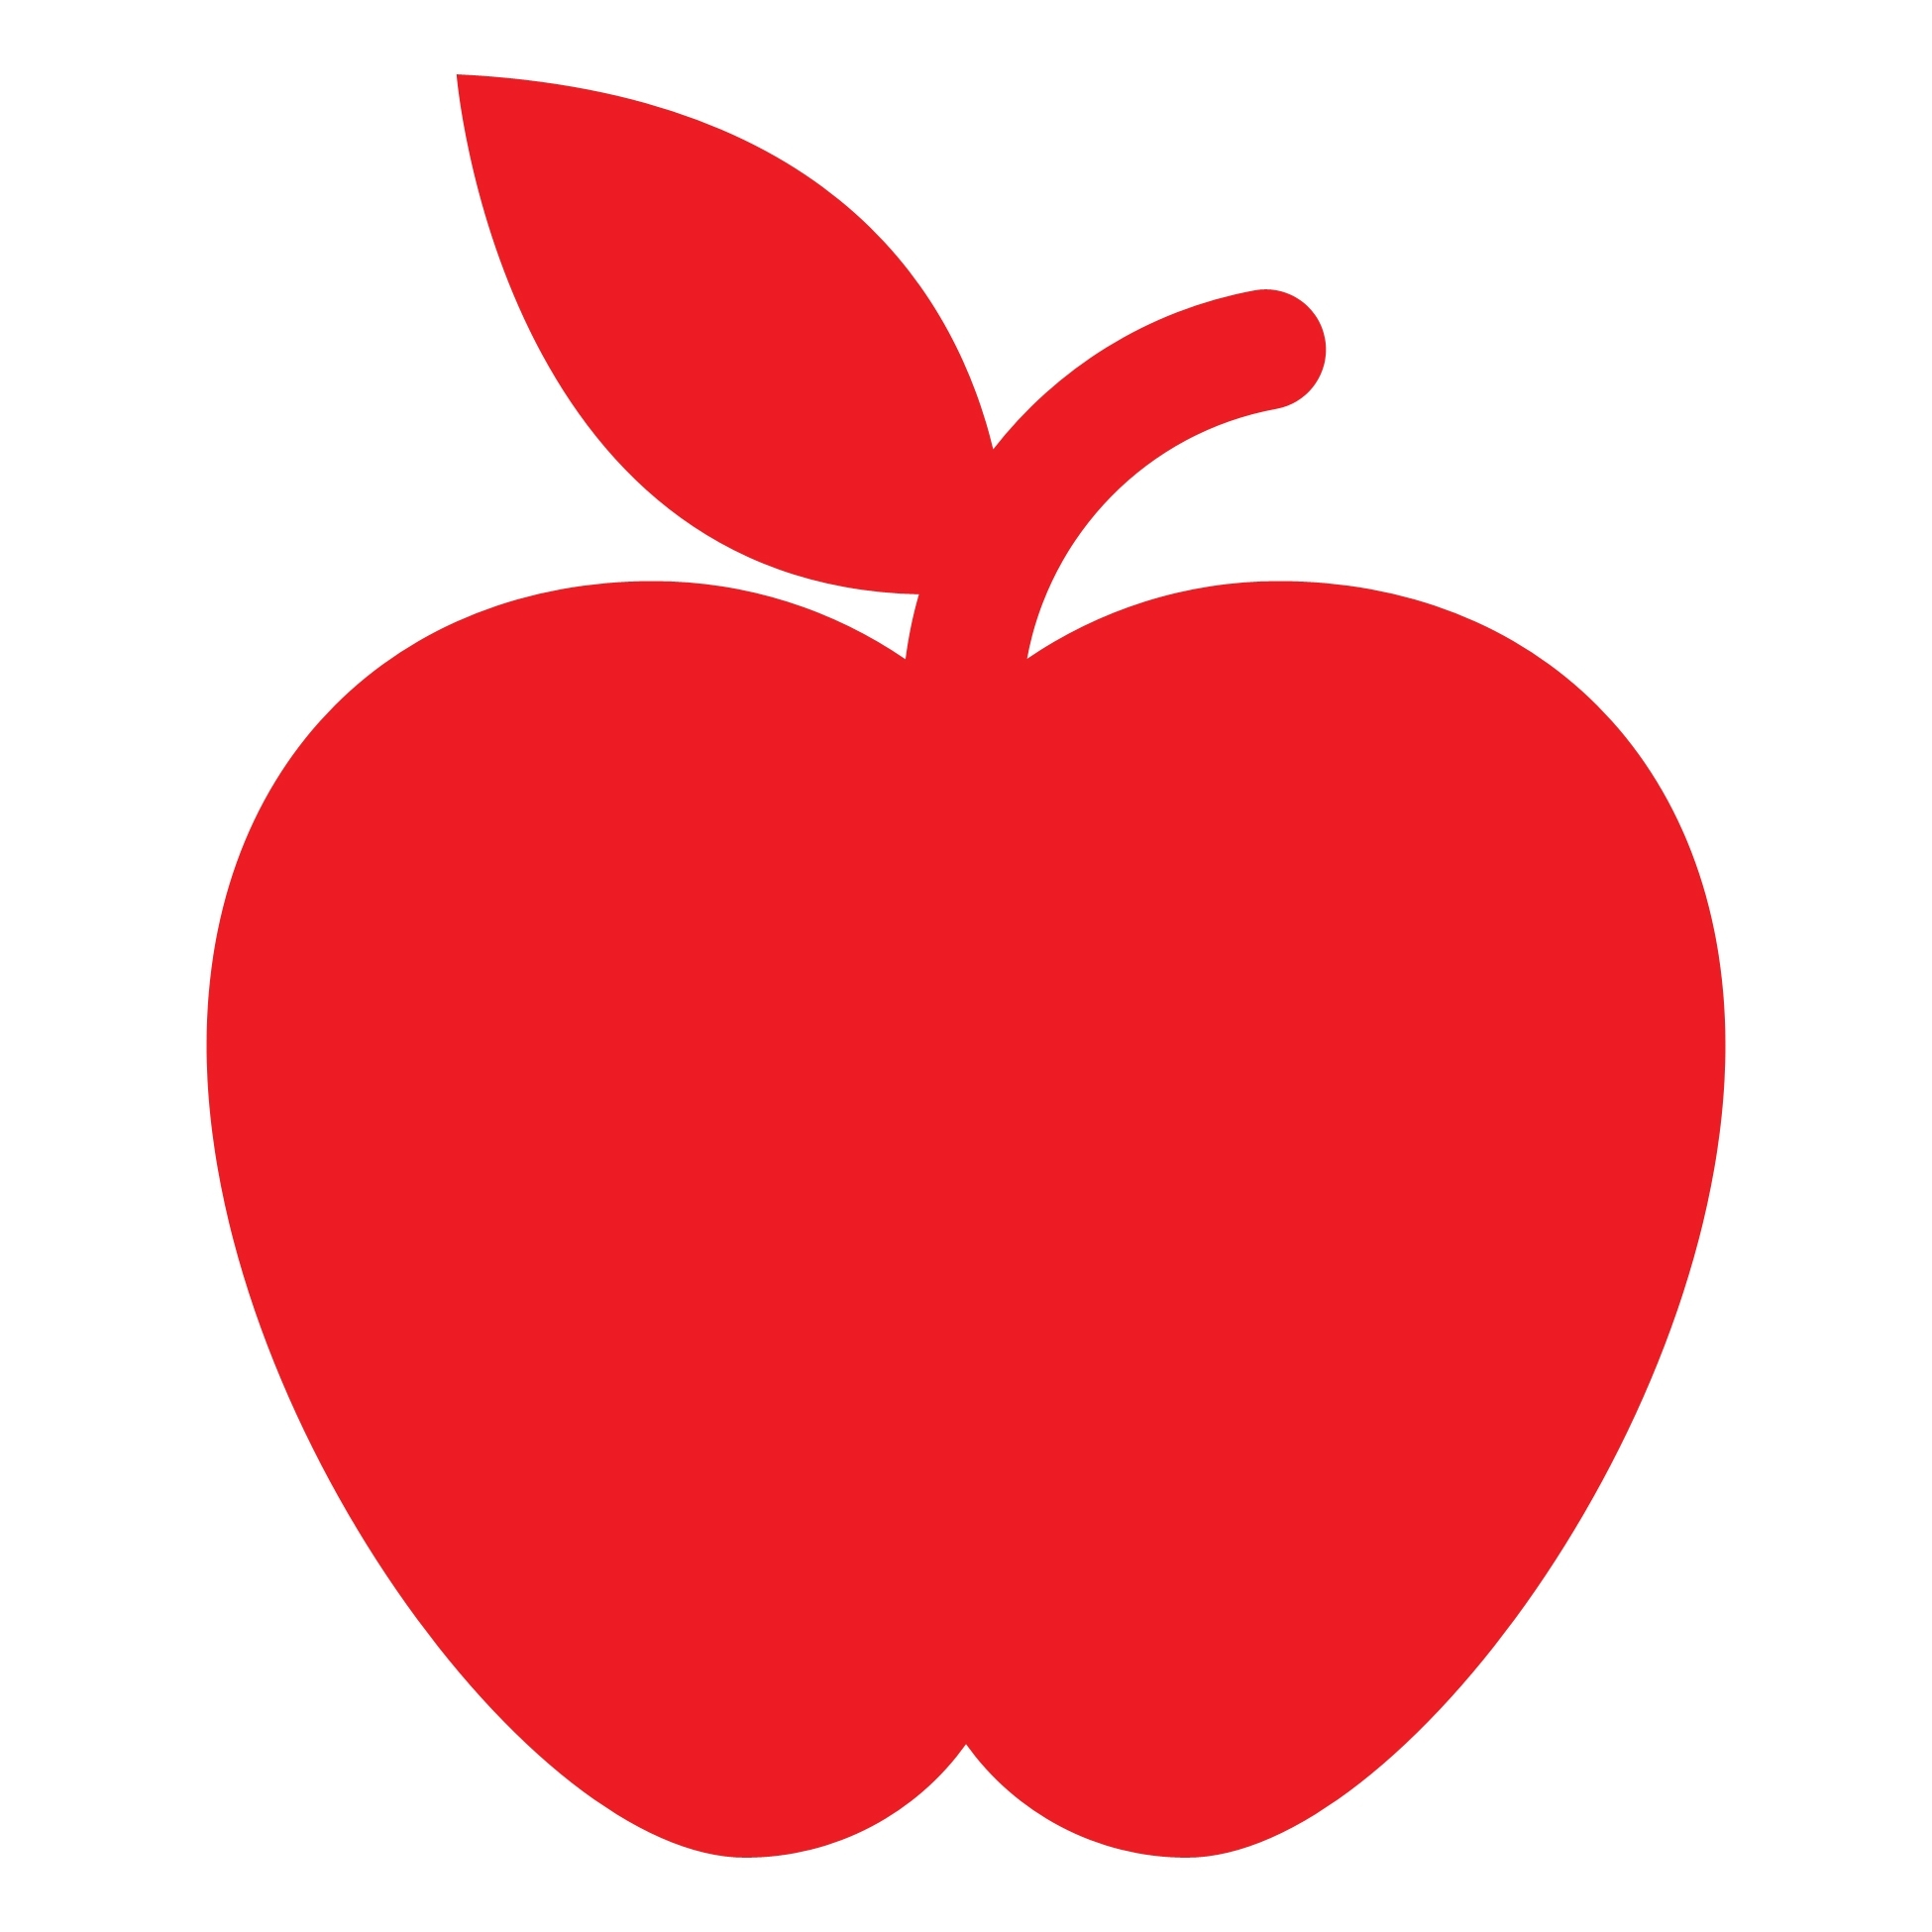 8f731d5b5cd8ea370654_apple_red_rgb_jpg.jpeg